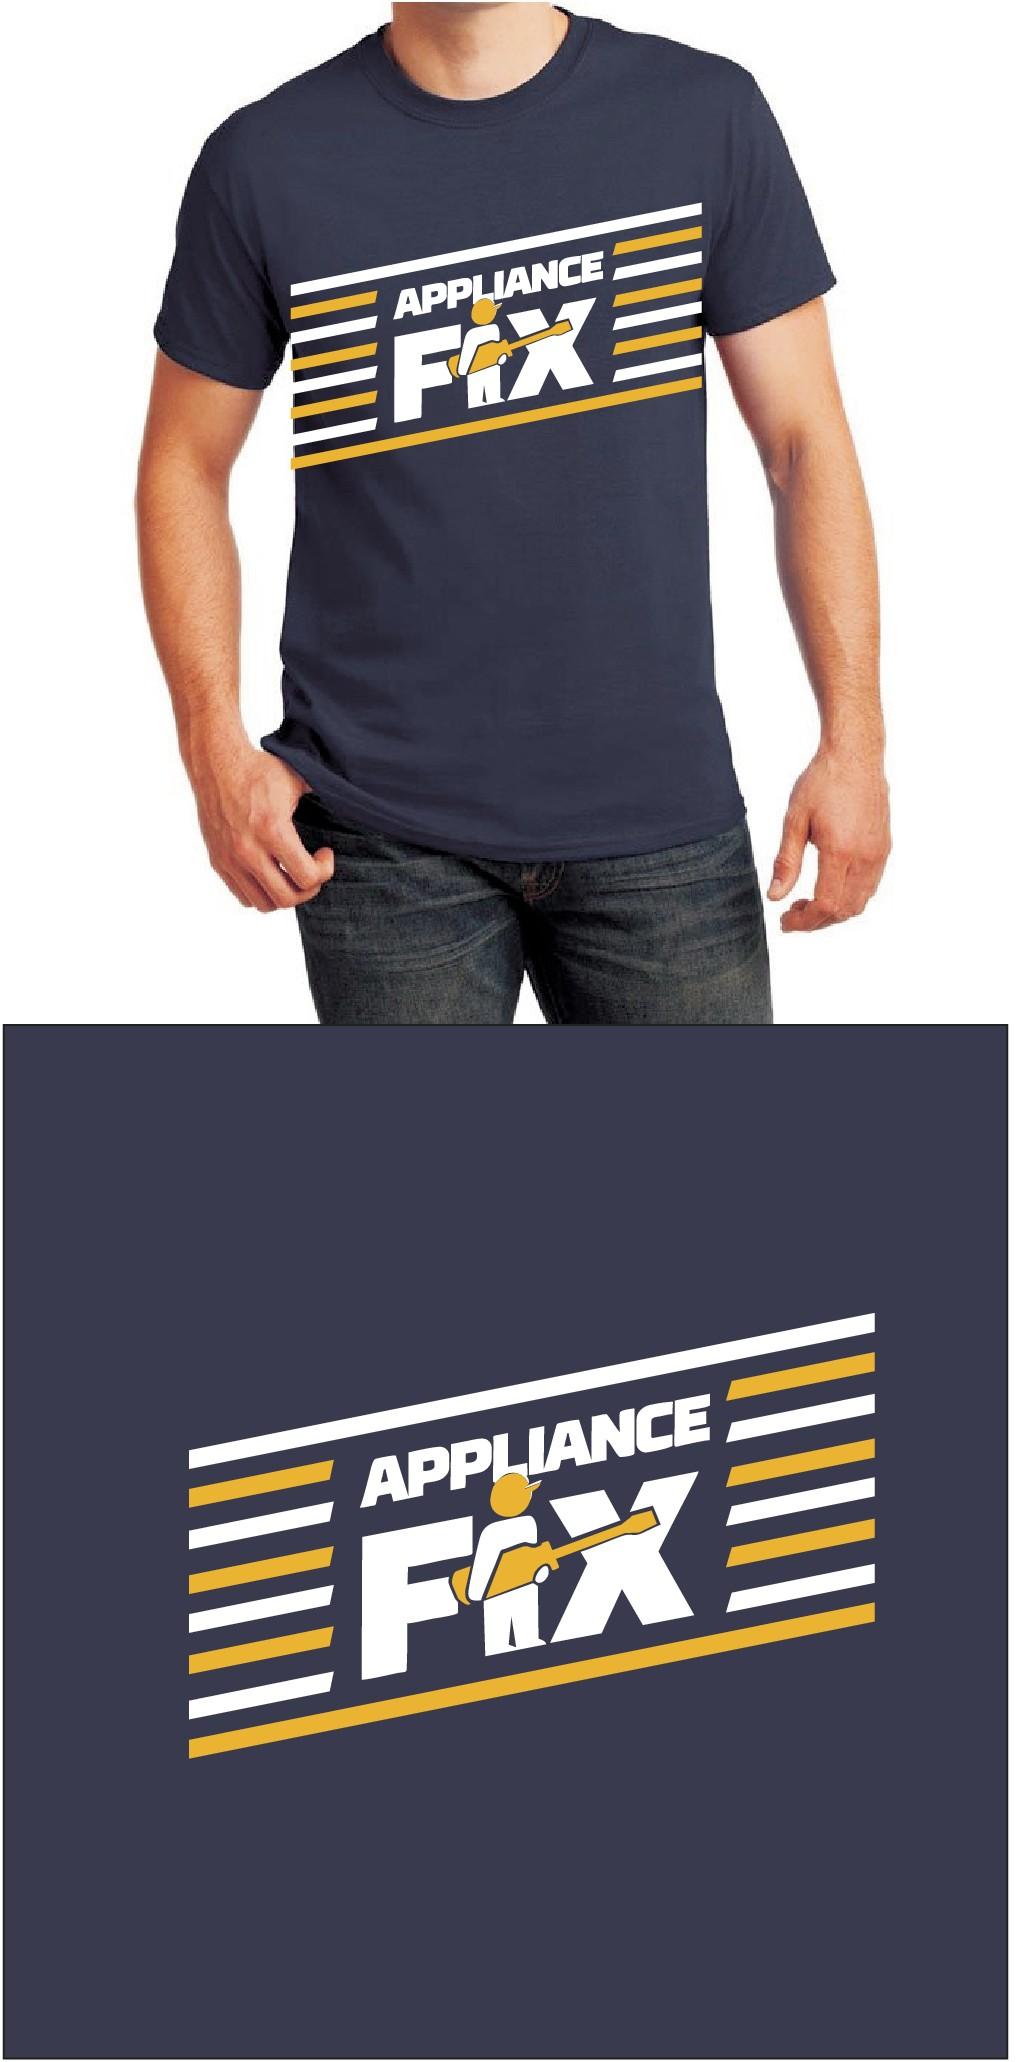 Appliance fix shirts